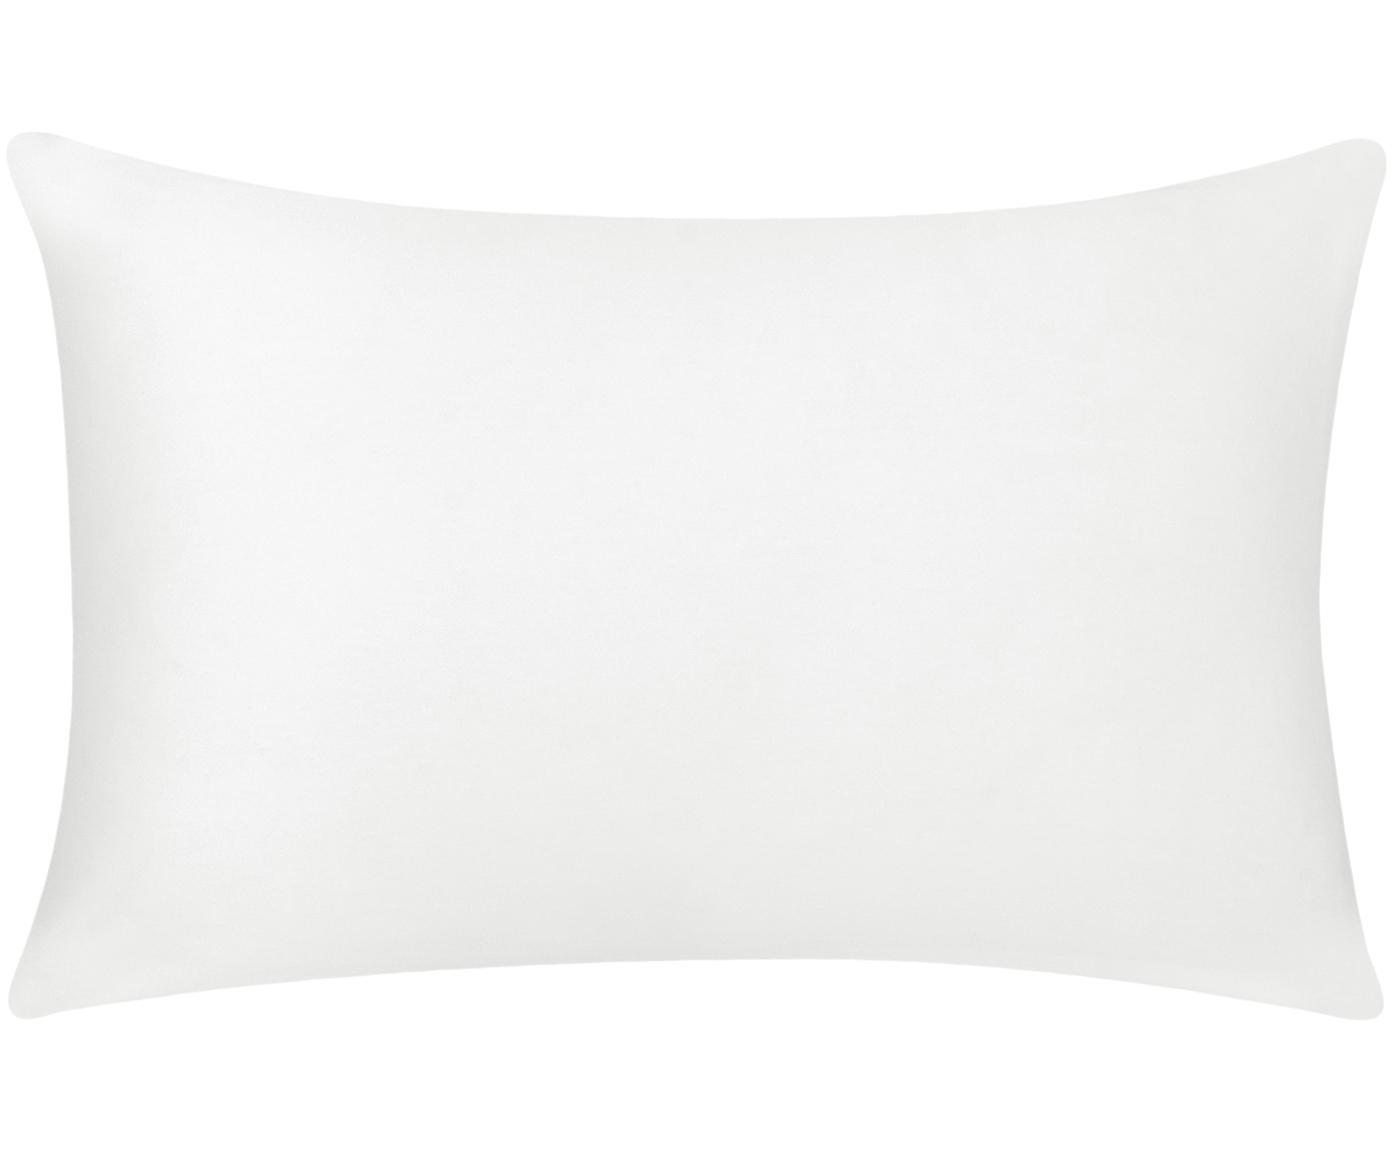 Federa arredo in cotone Mads, Cotone, Bianco, Larg. 30 x Lung. 50 cm